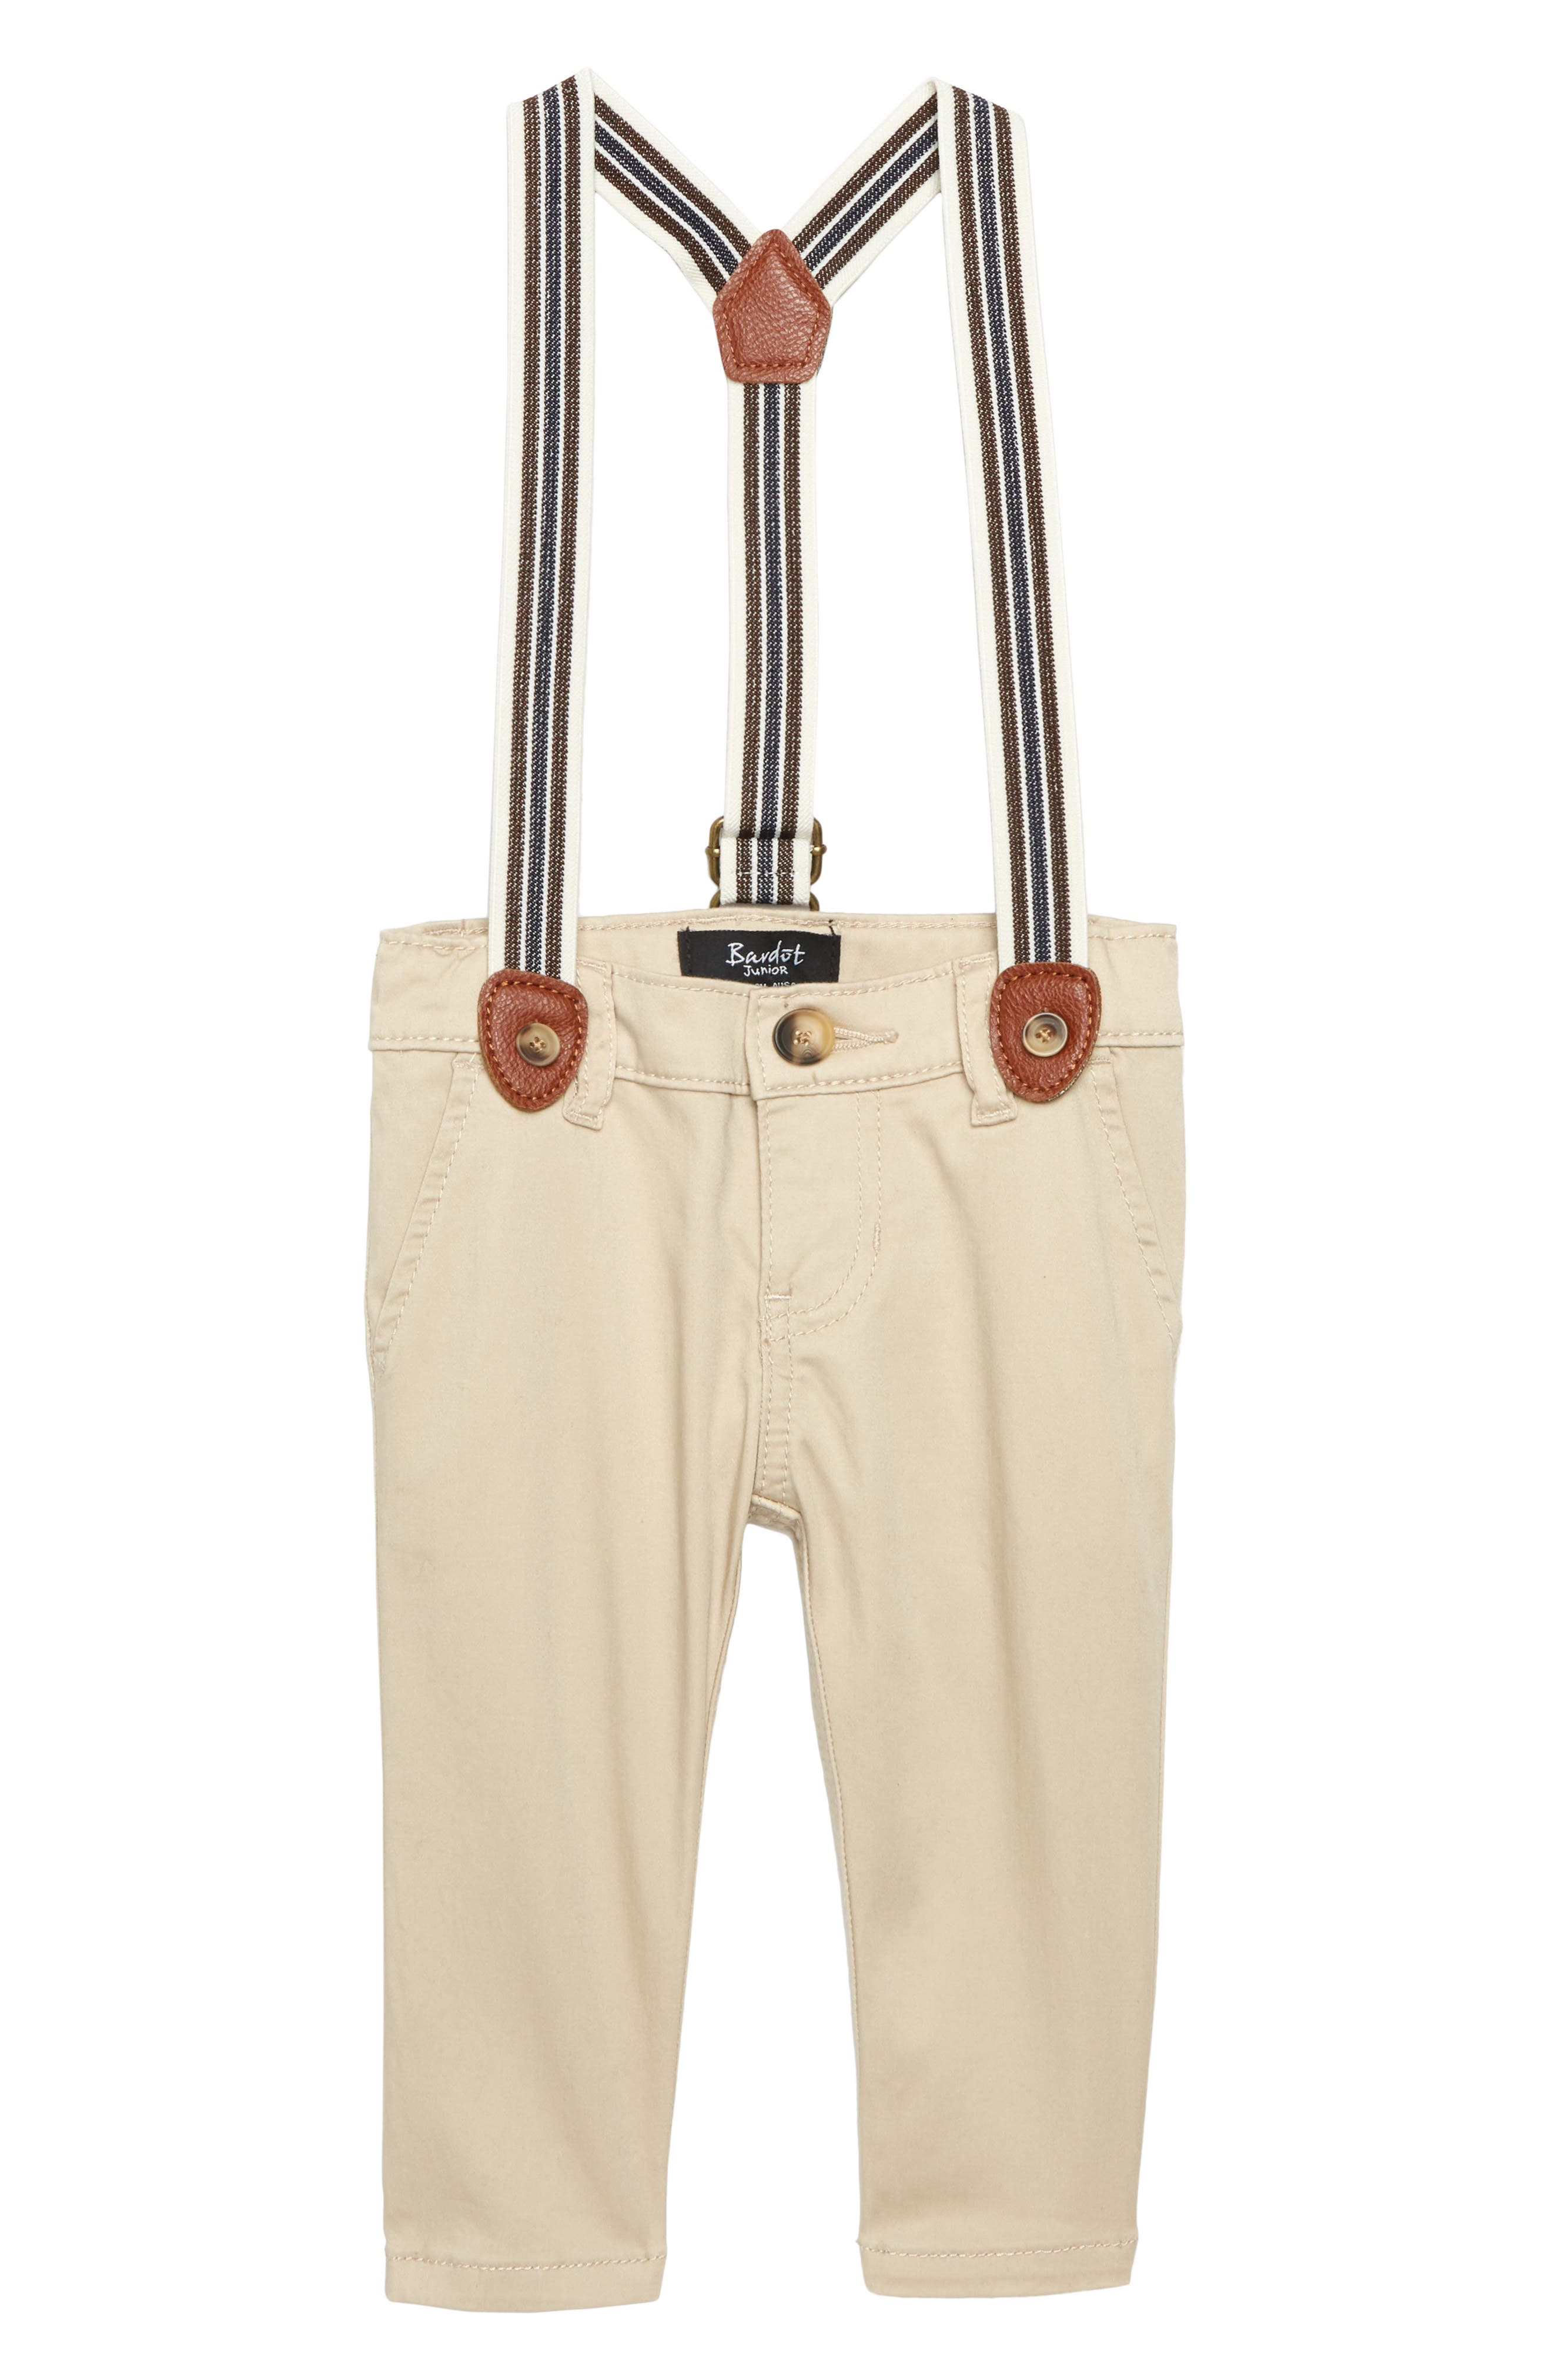 Chinos & Suspenders Set, Main, color, STONE